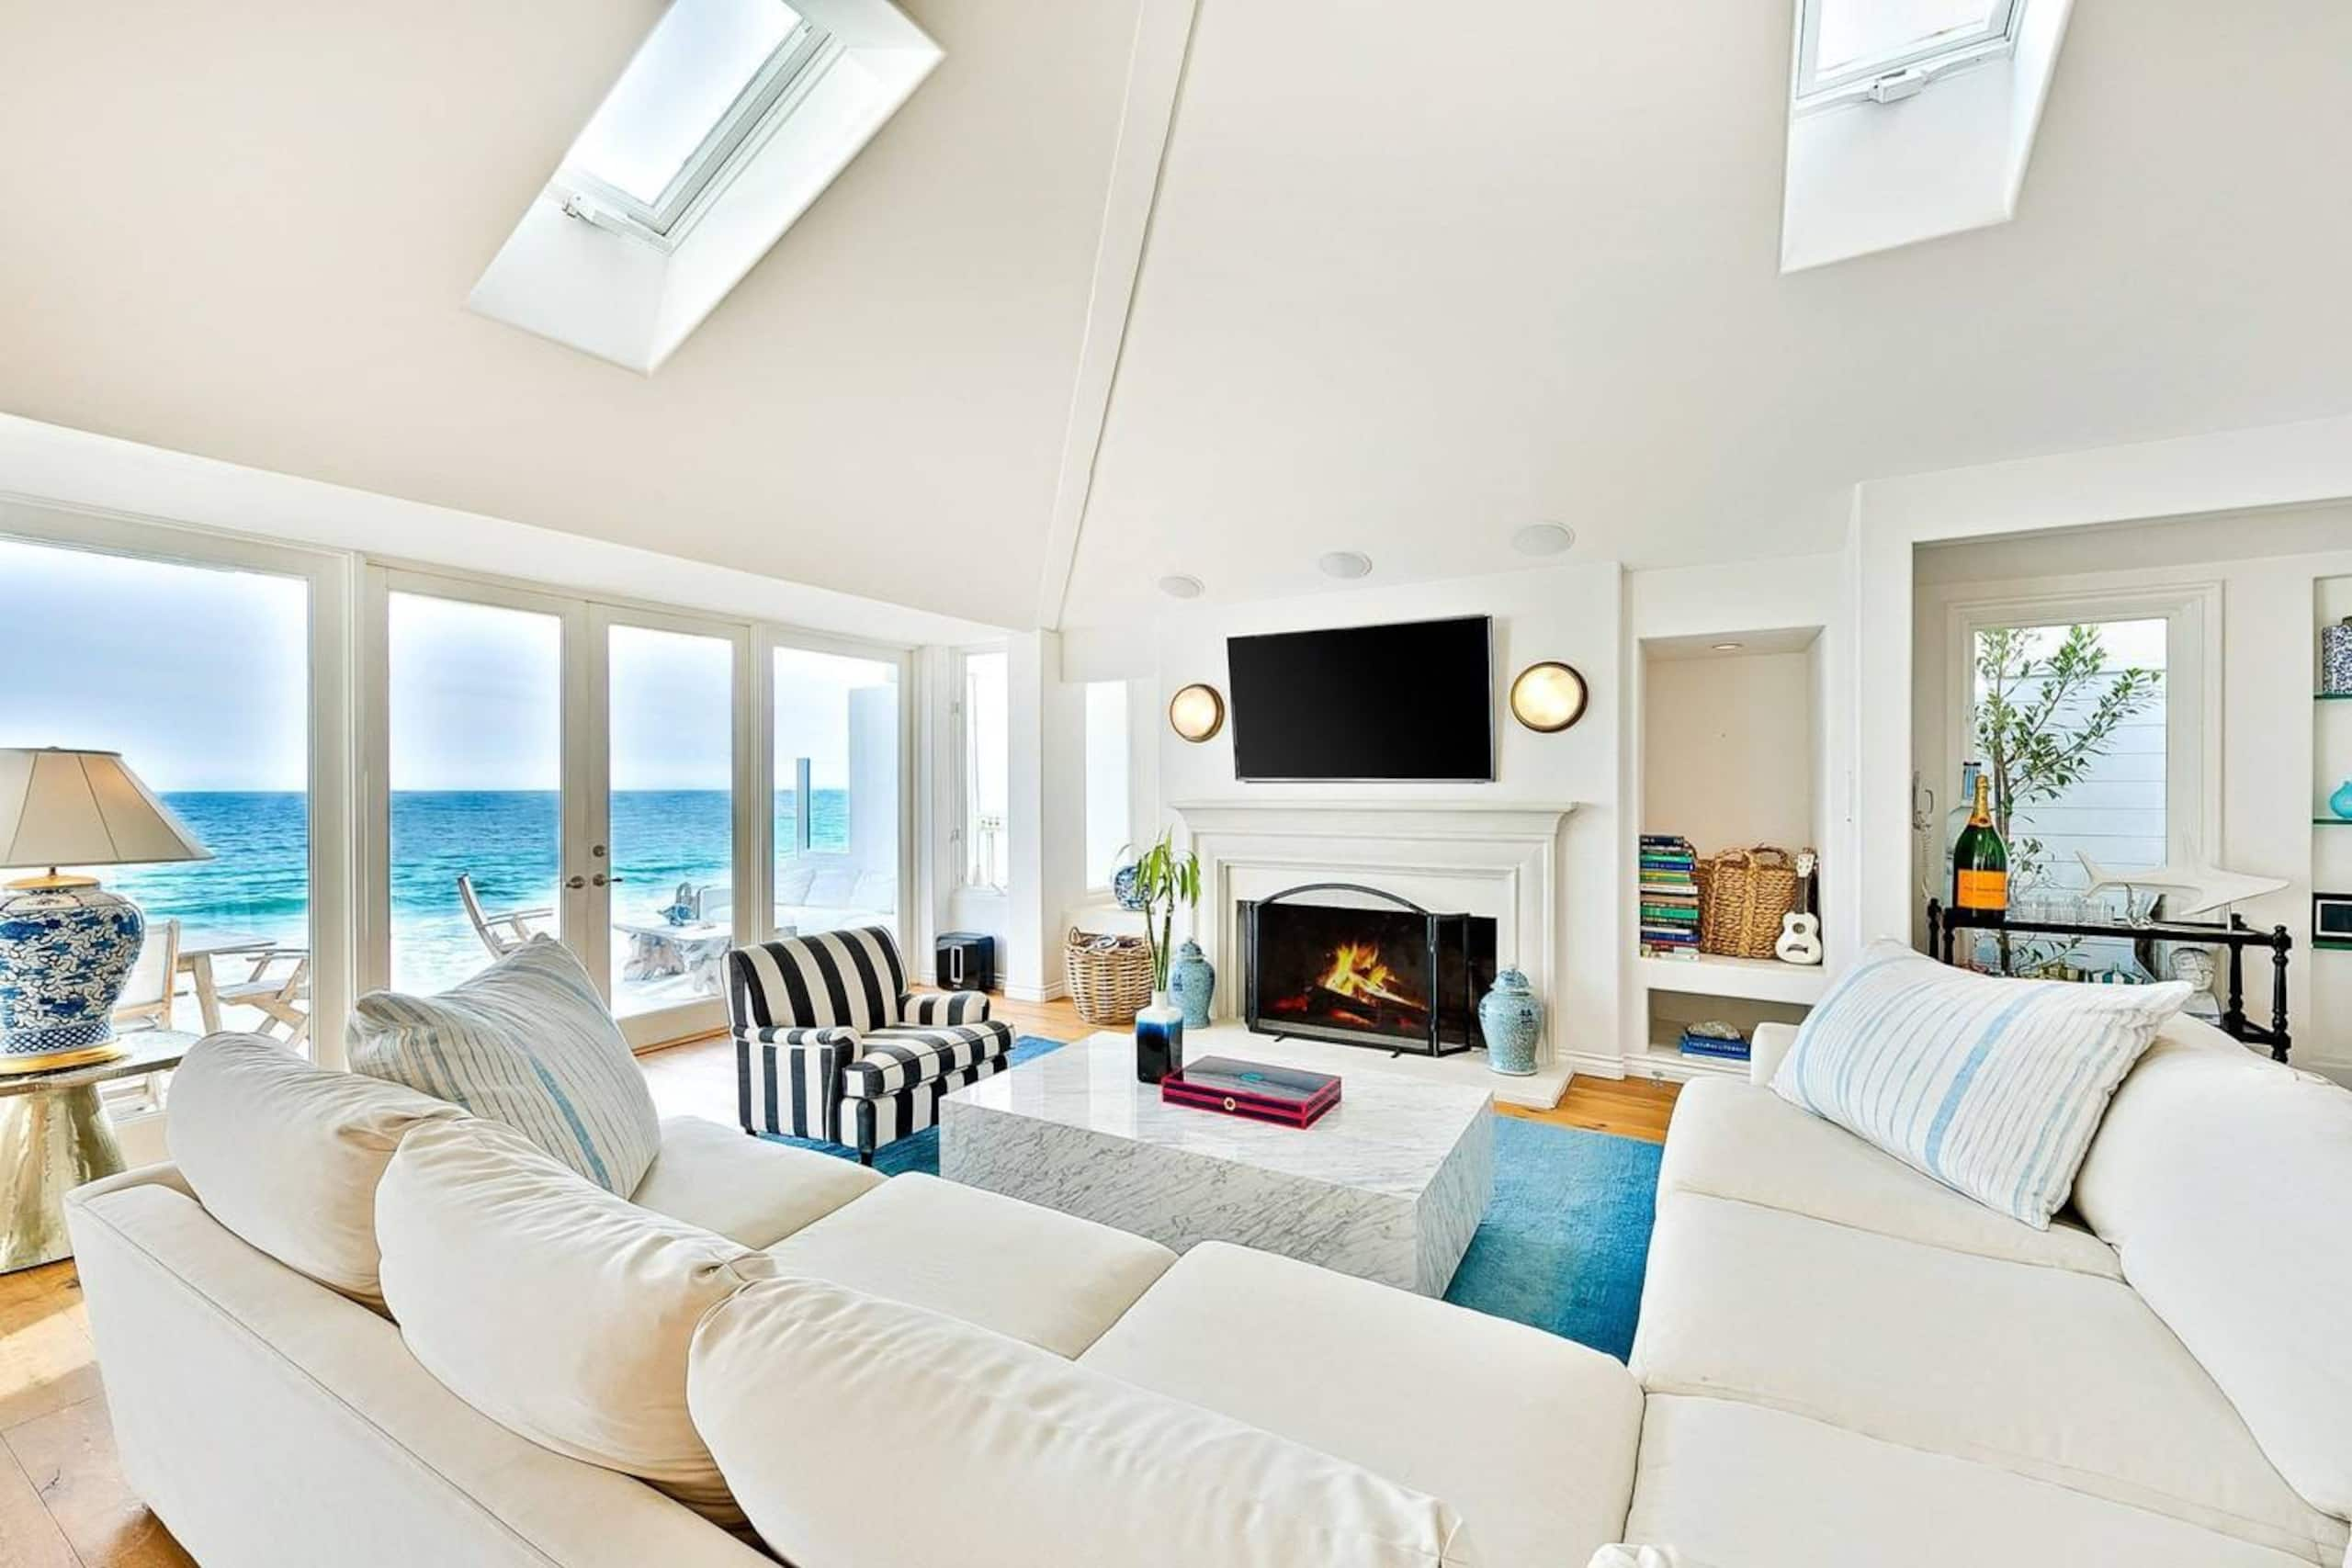 Apartment Villa Shawaiz - Beachfront Villa with 5 beds  photo 20308469